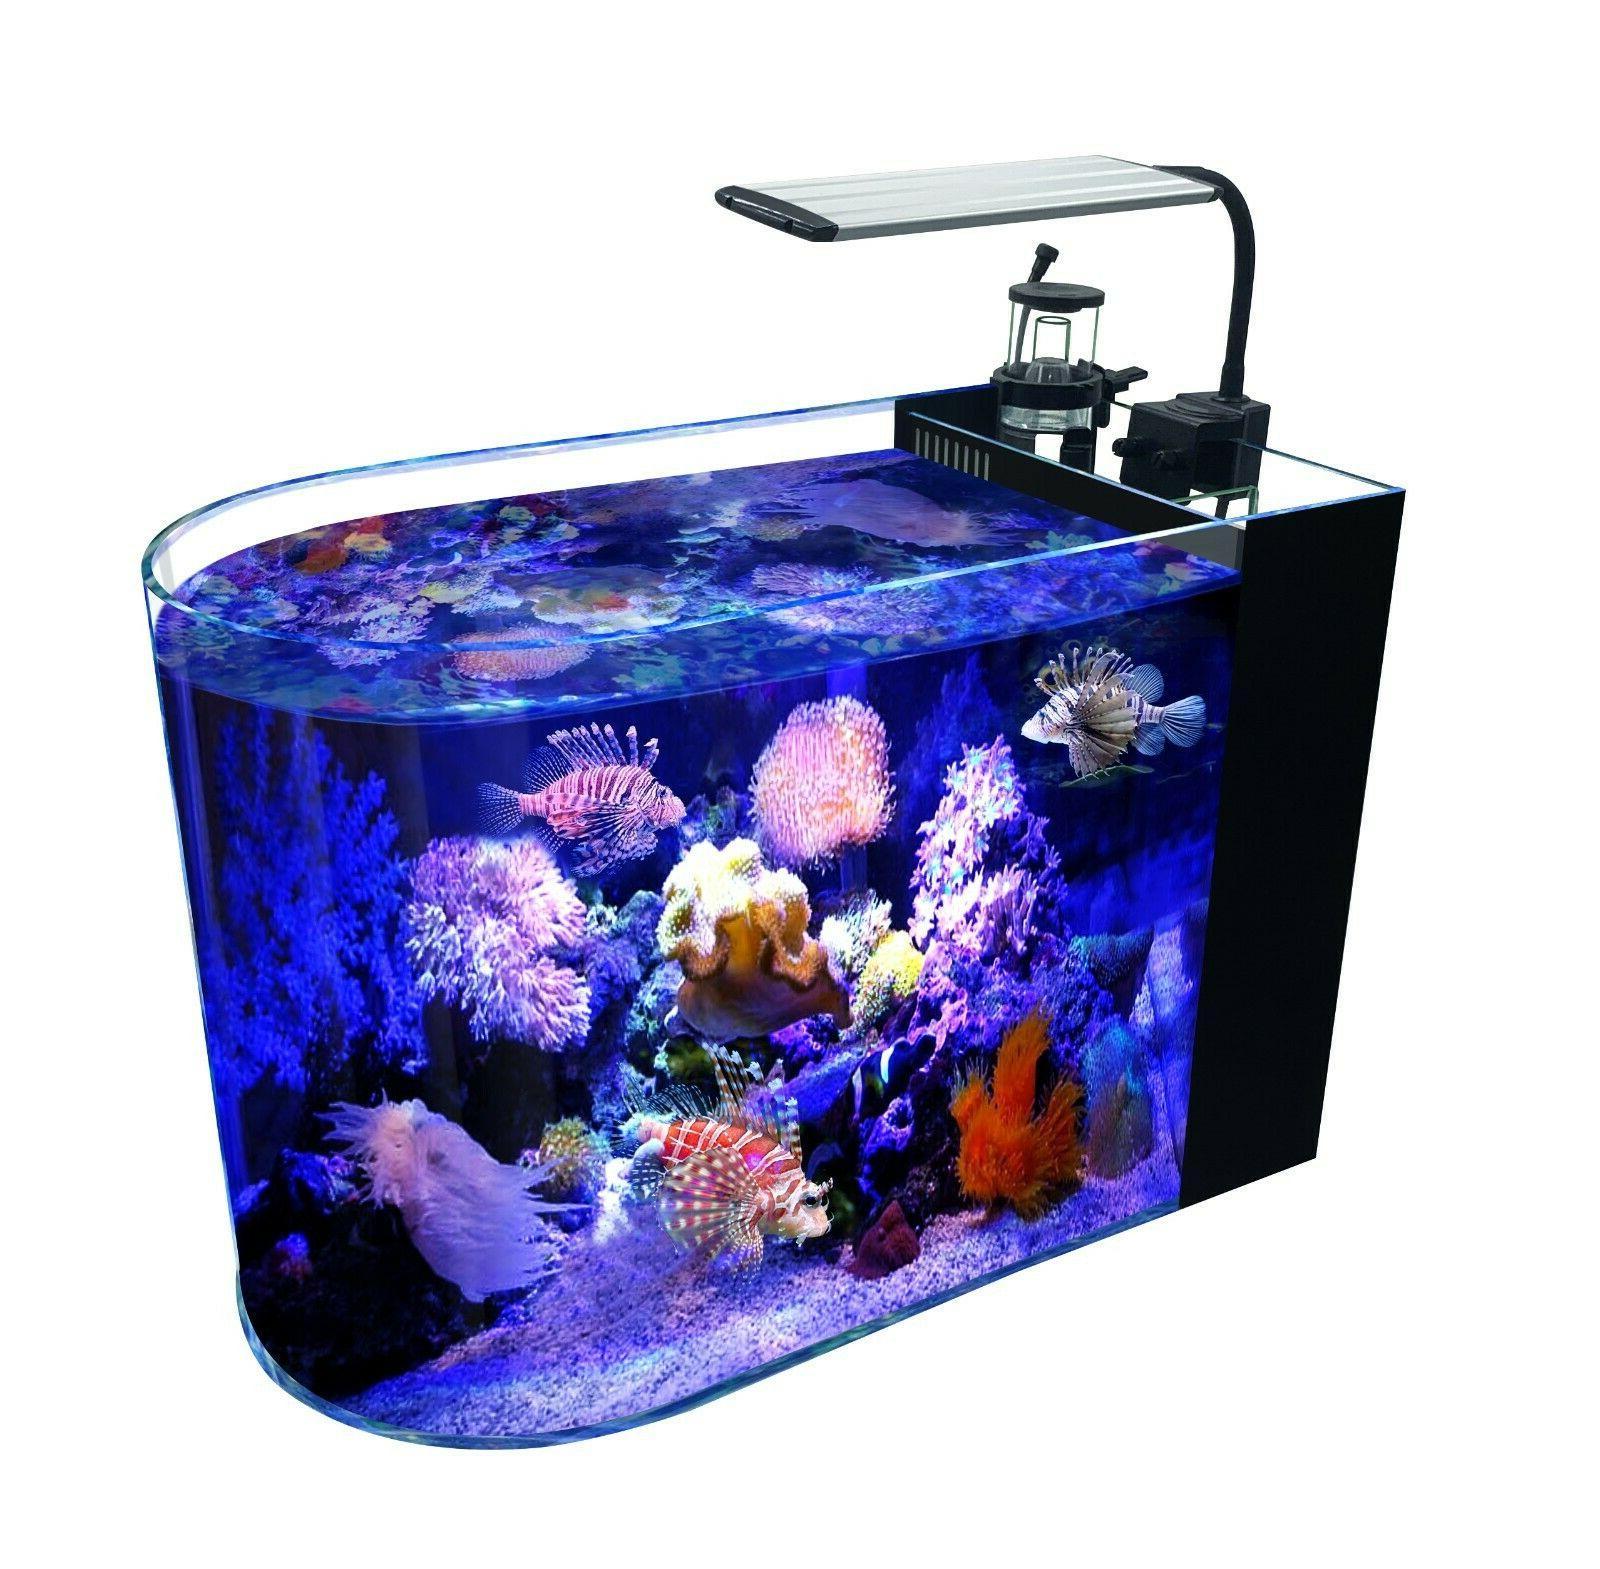 12 gallon saltwater aquarium marine fish tank